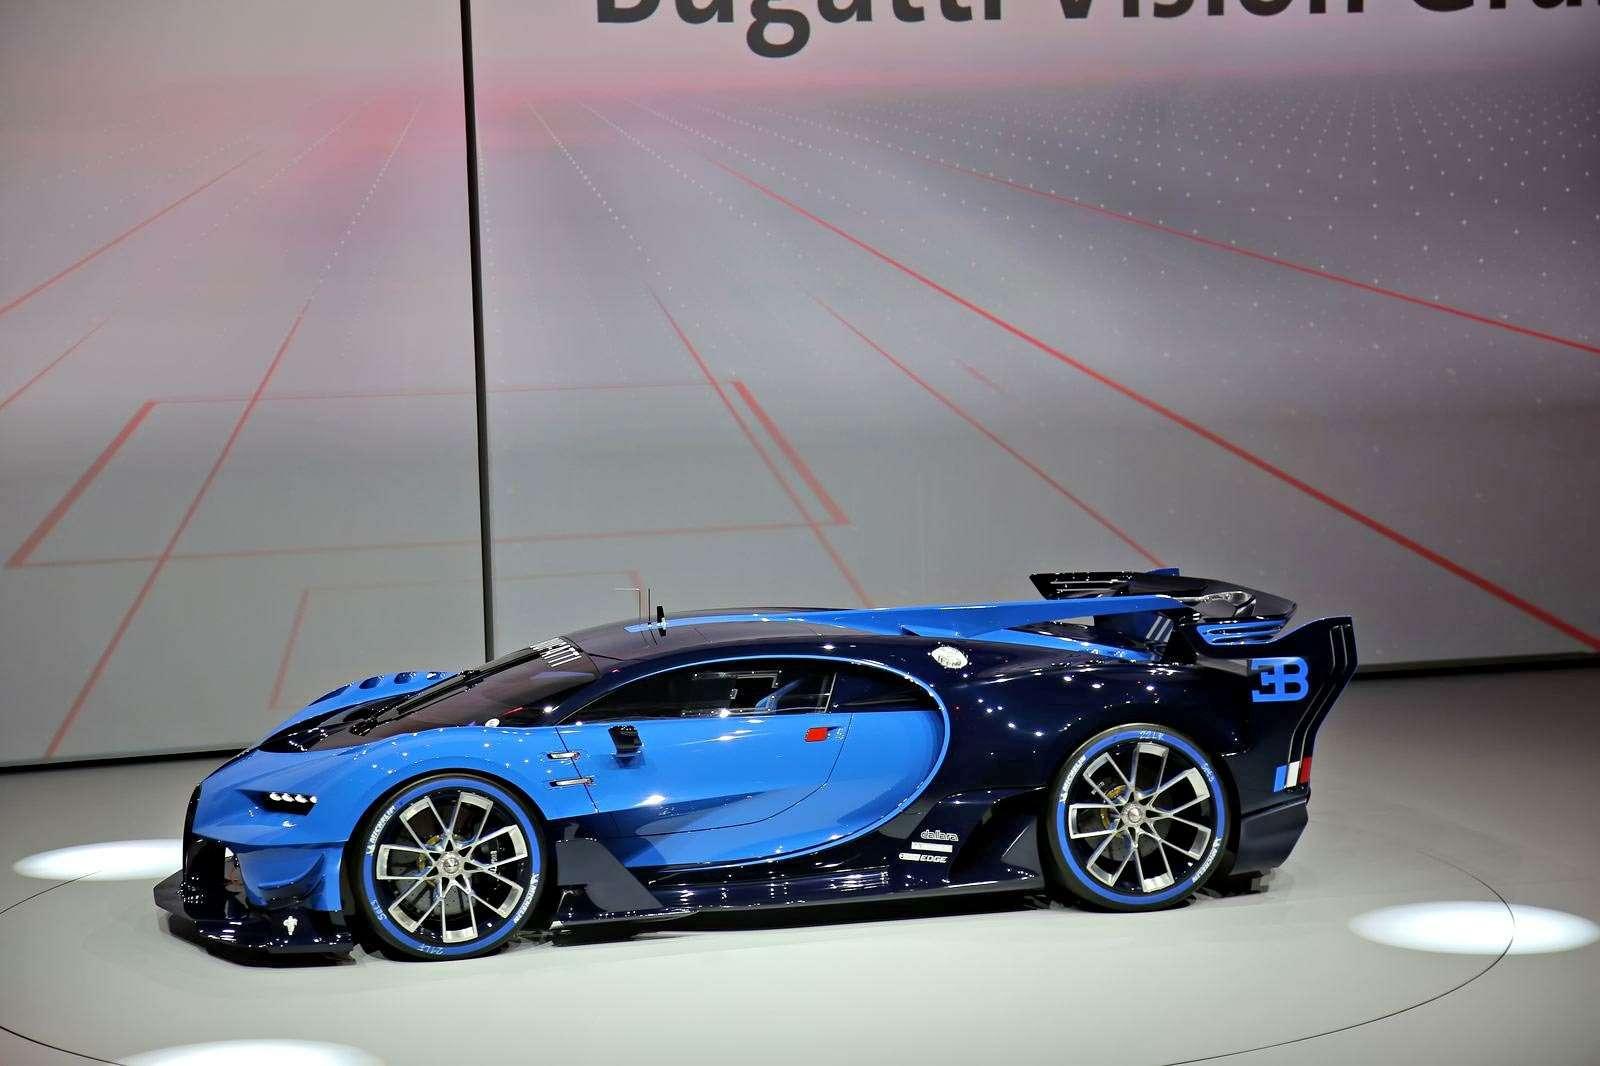 Bugatti_Vision-GT_Kadakov